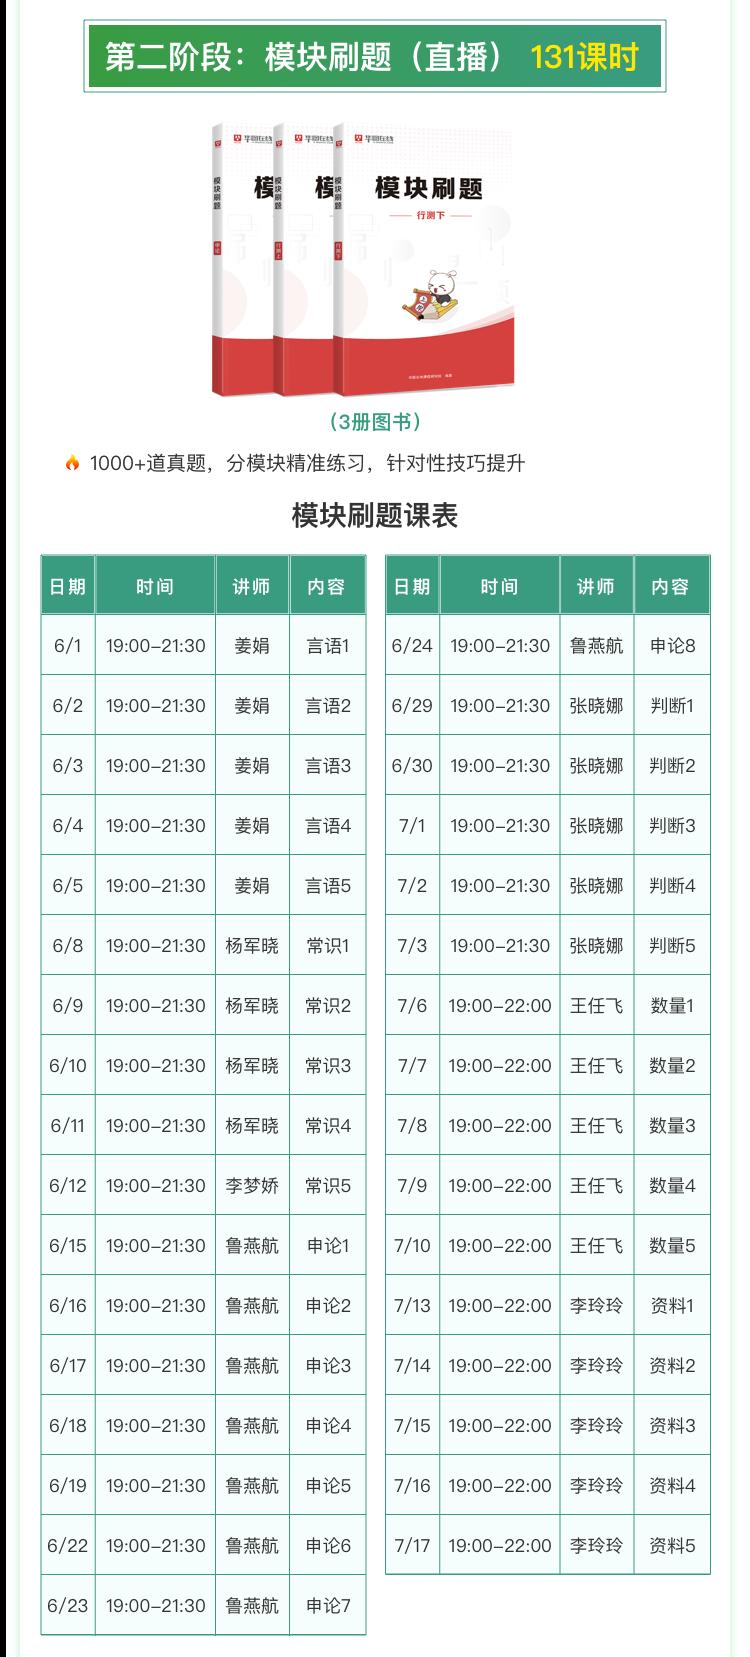 http://upload.htexam.com/userimg/2021国考系统提分班刷题1期.png